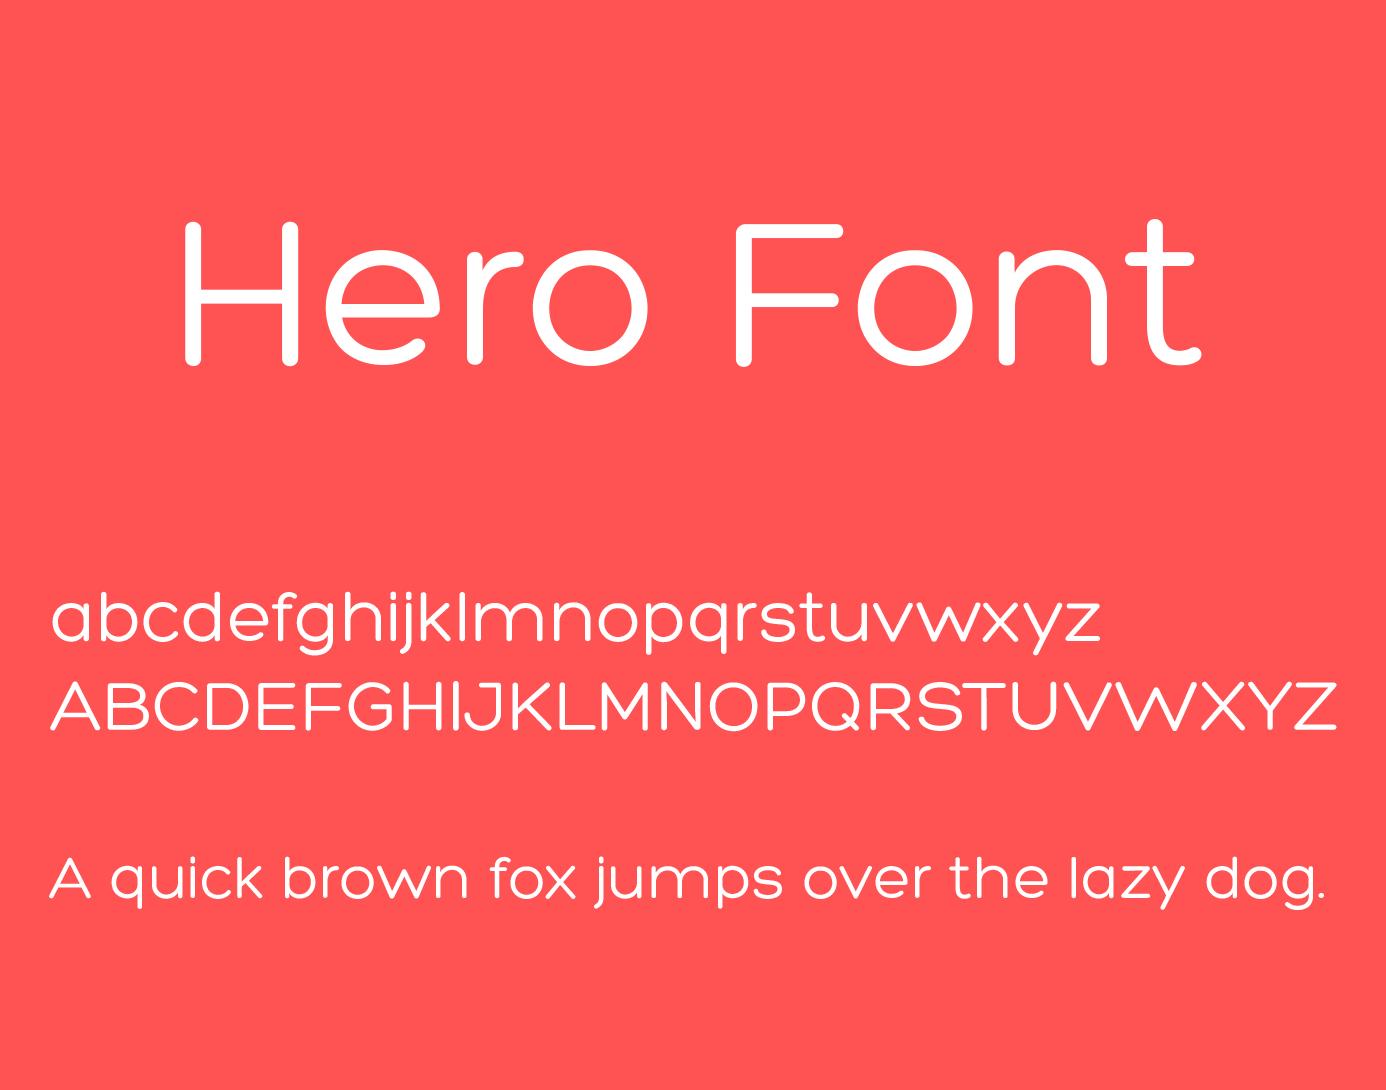 https://fontclarity.com/wp-content/uploads/2019/09/hero-font-download-0.png Free Download